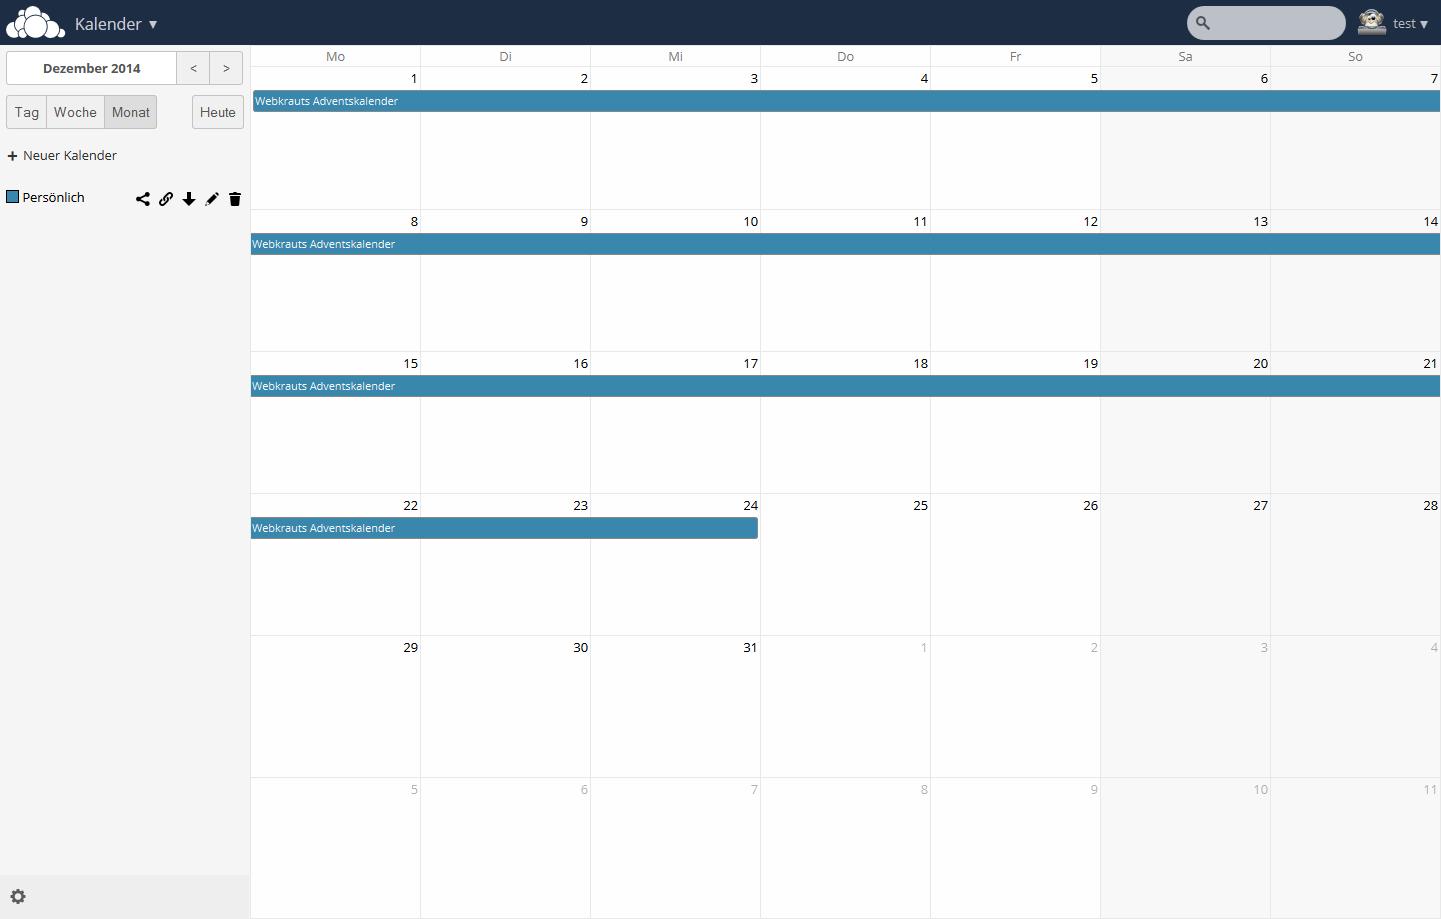 ownCloud Kalender Demo auf demo.owncloud.org